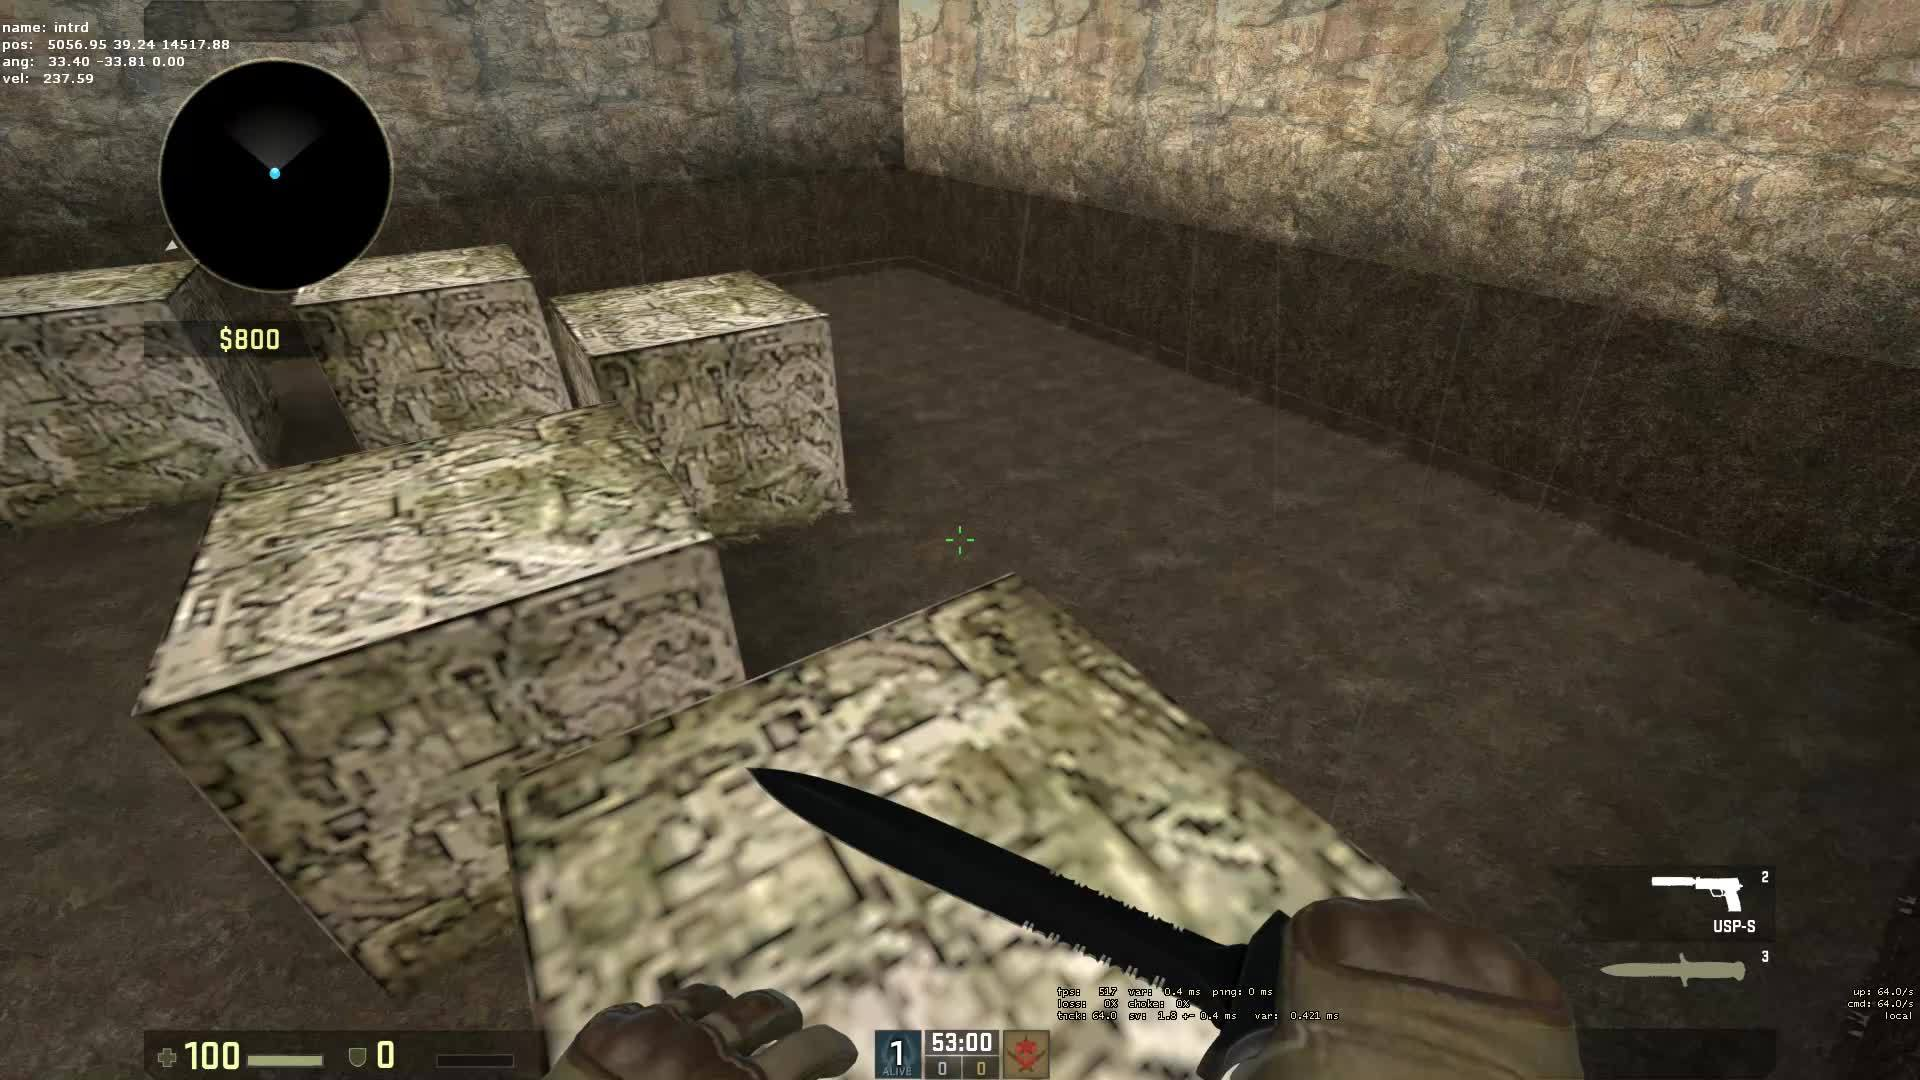 counterstrike, intrd CS:GO - bhop training tick64 GIFs